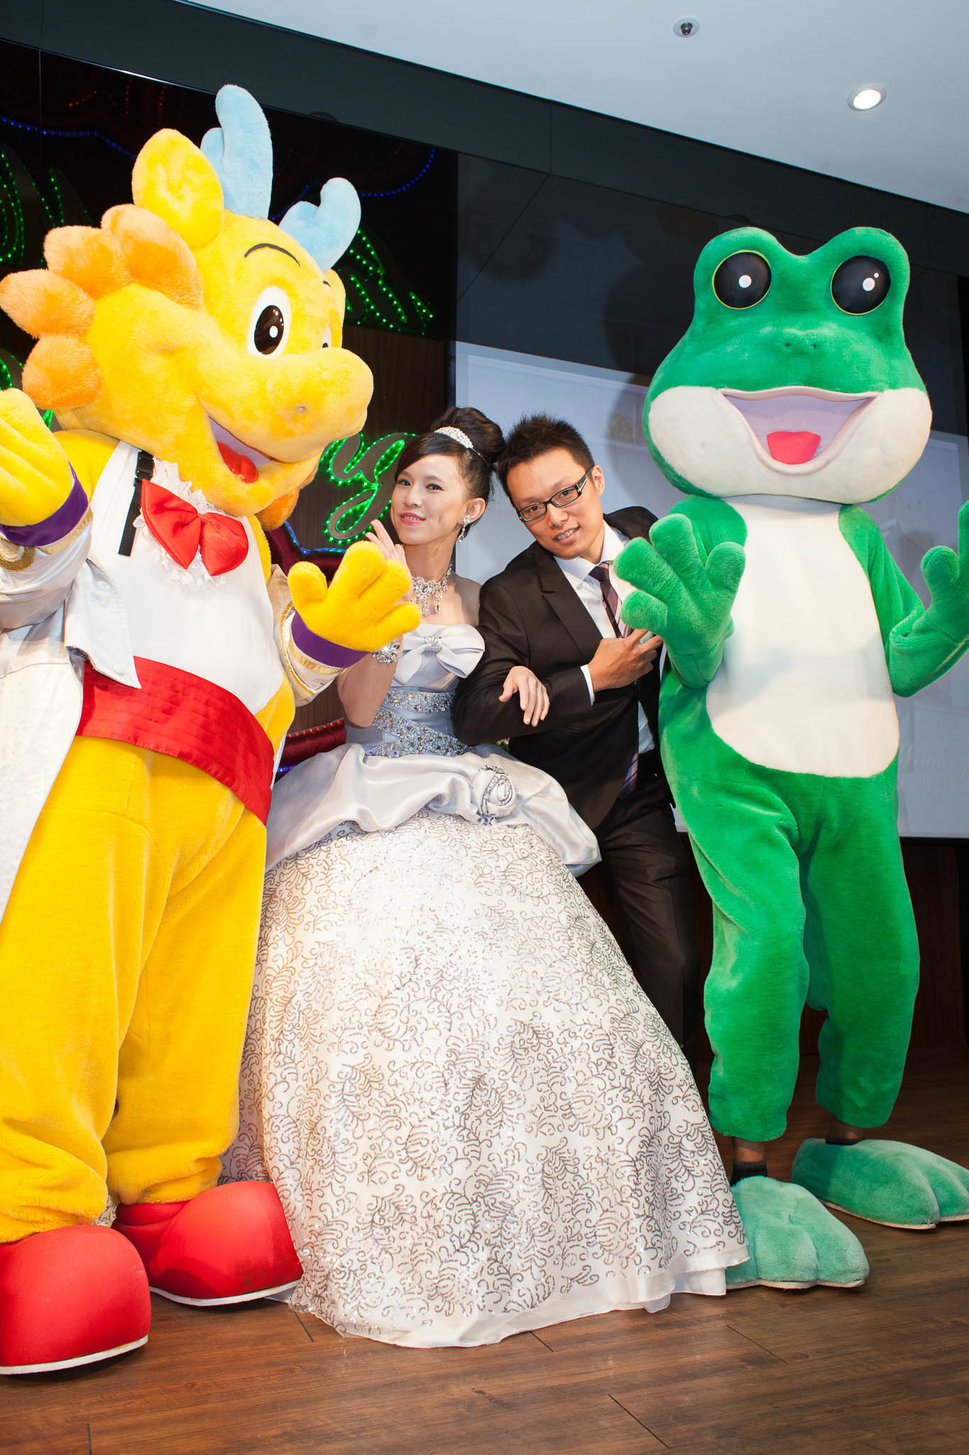 18PHOTO-青蛙王子娶新娘❤️(編號:218652) - 18PHOTO 婚紗影像攝影工作室 - 結婚吧一站式婚禮服務平台